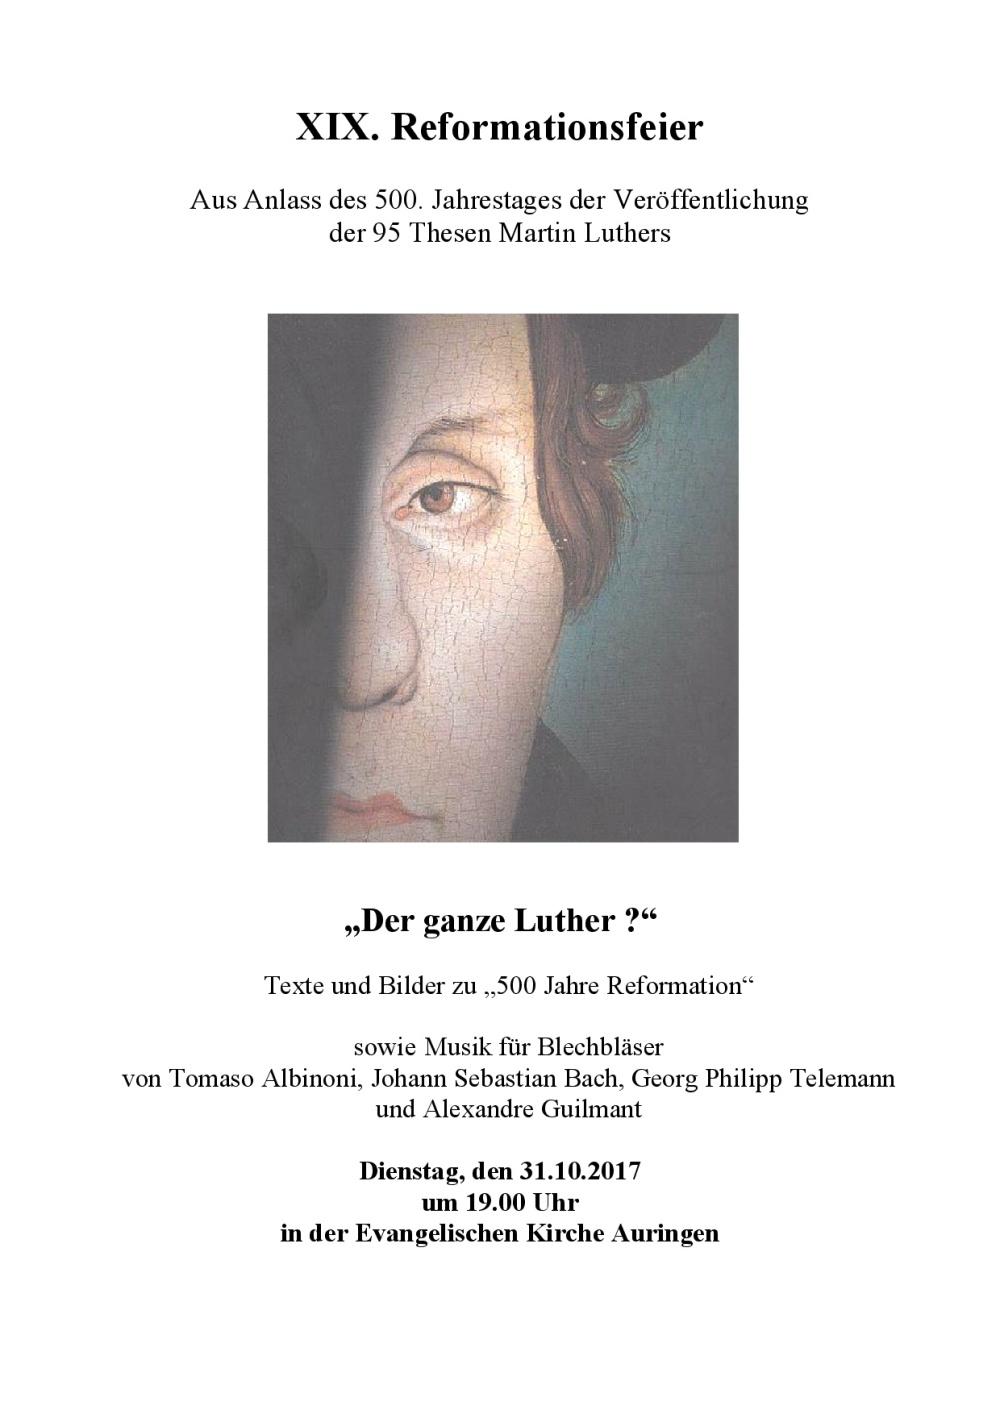 2017-10-31 Reformationsfeier 2017-001